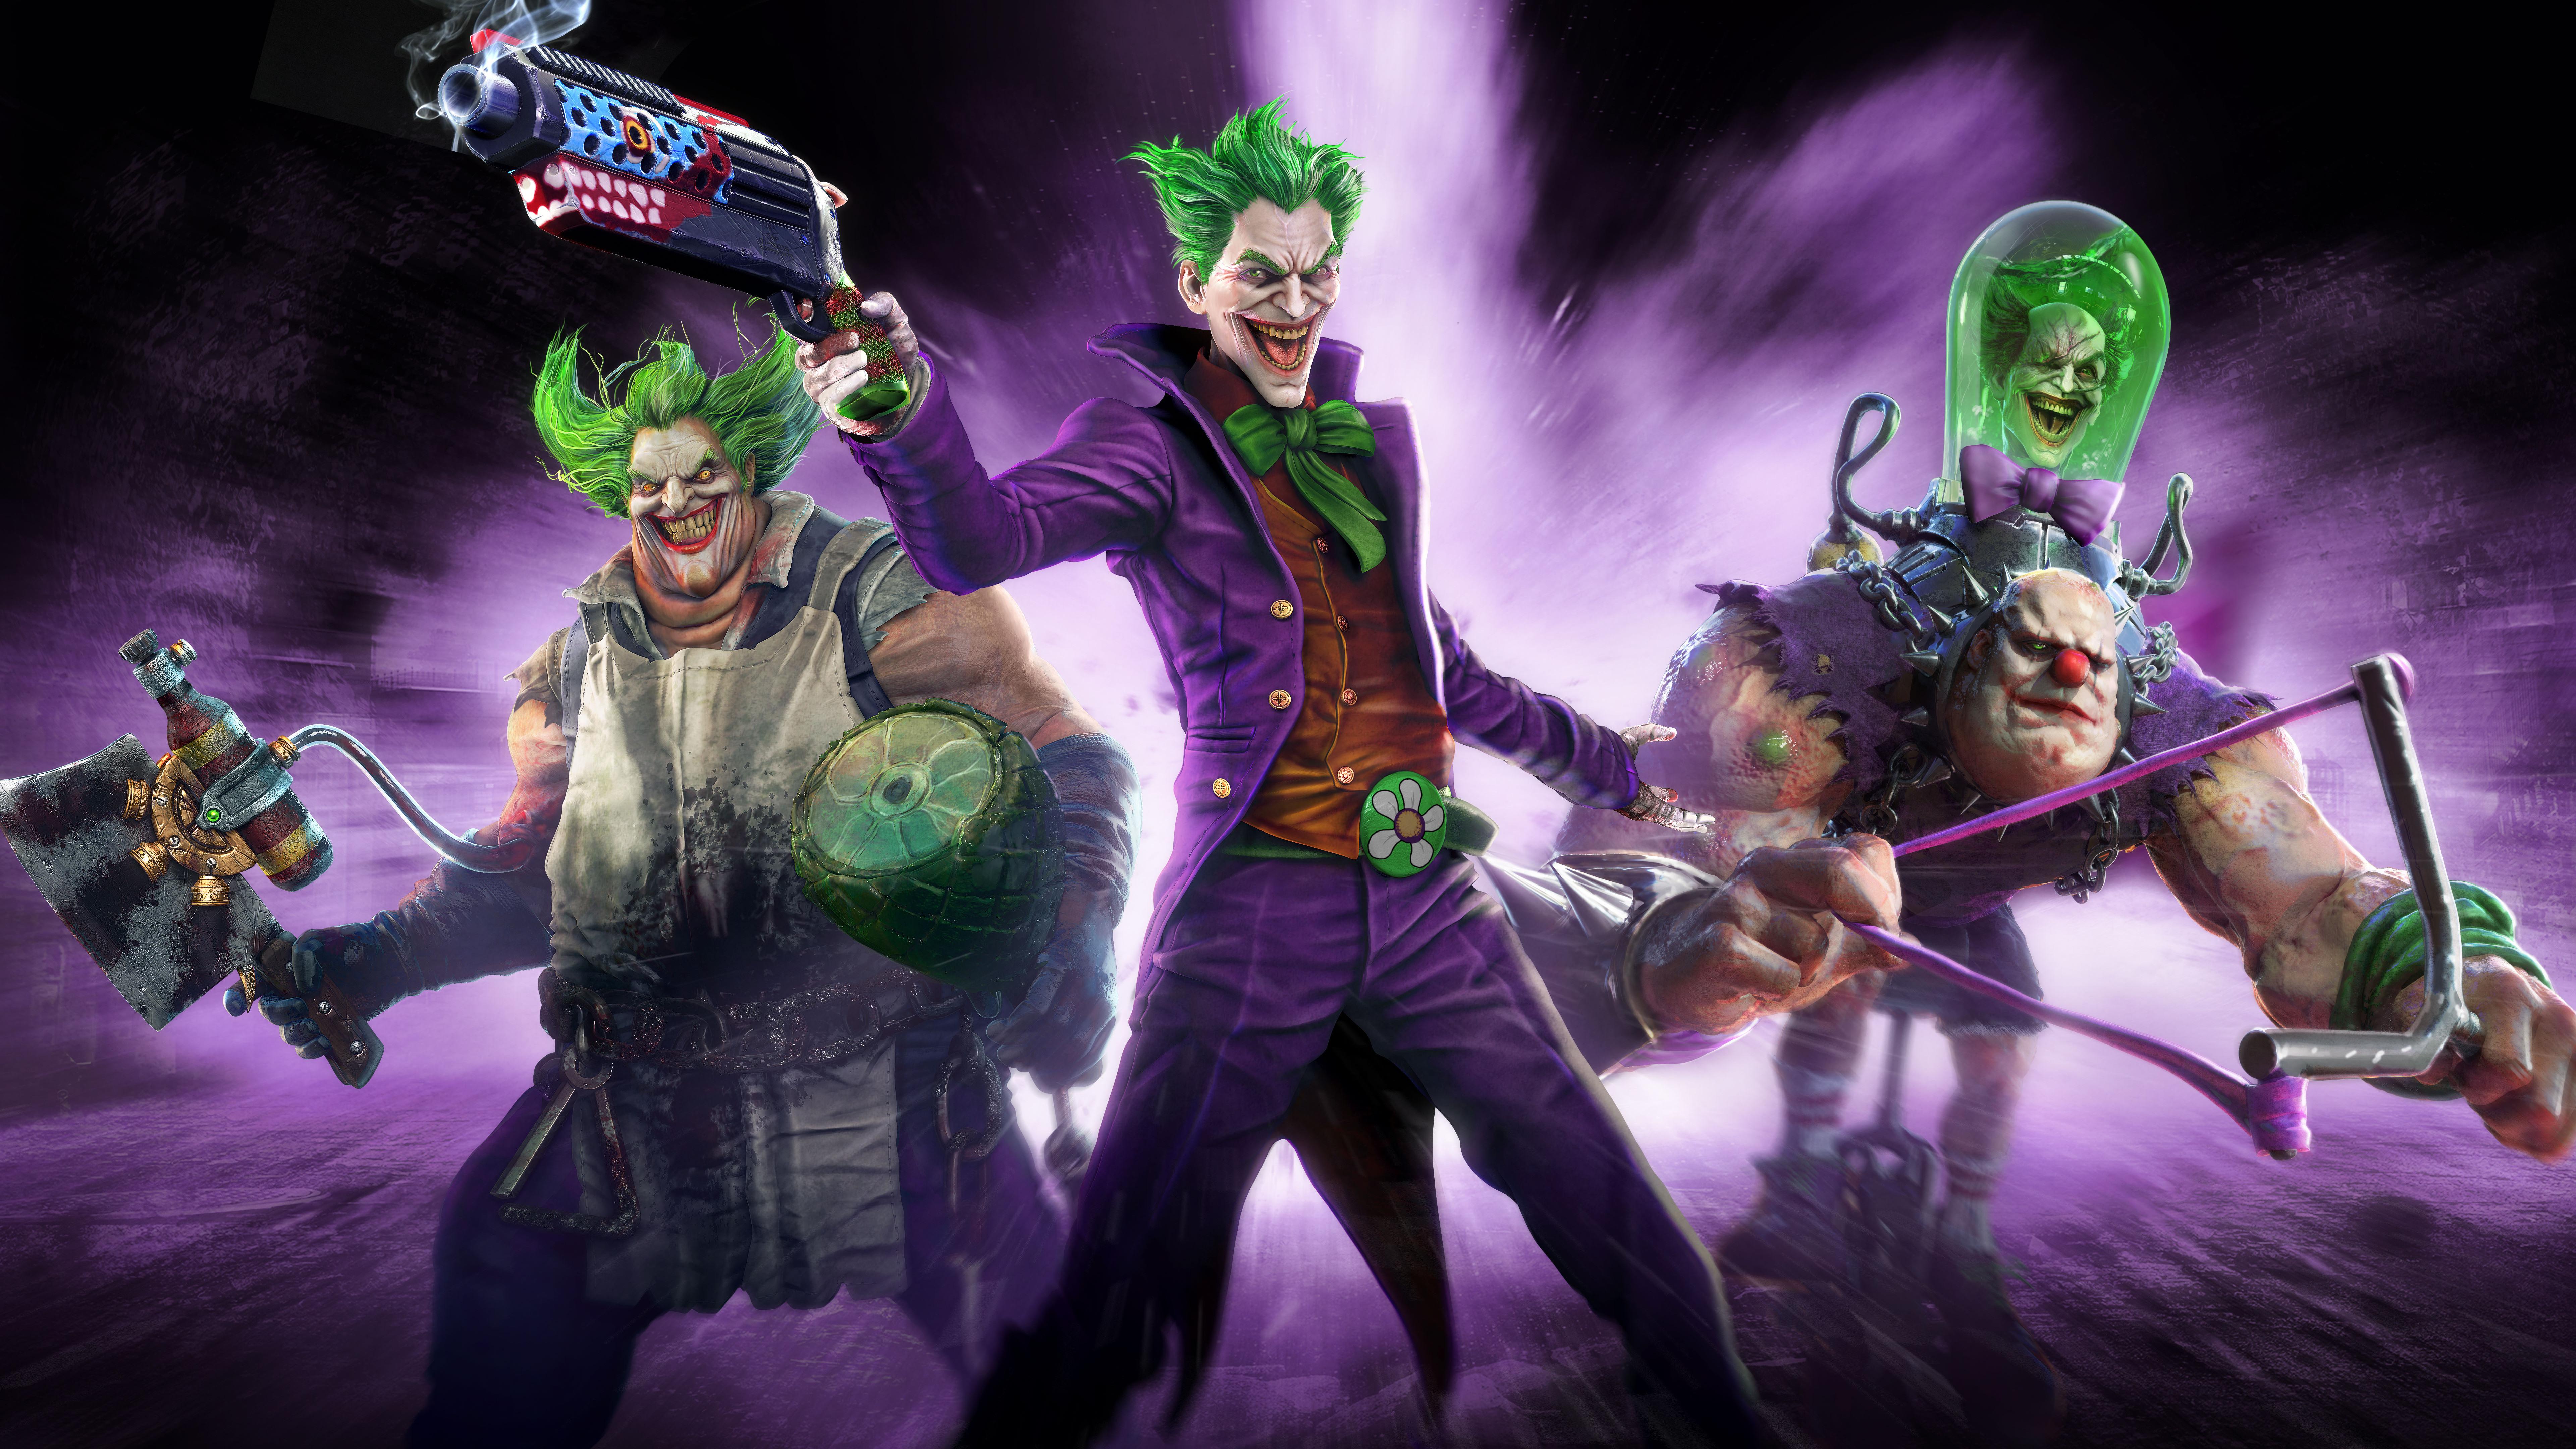 7680x4320 Infinite Crisis Jokers 8k HD 4k Wallpapers ...